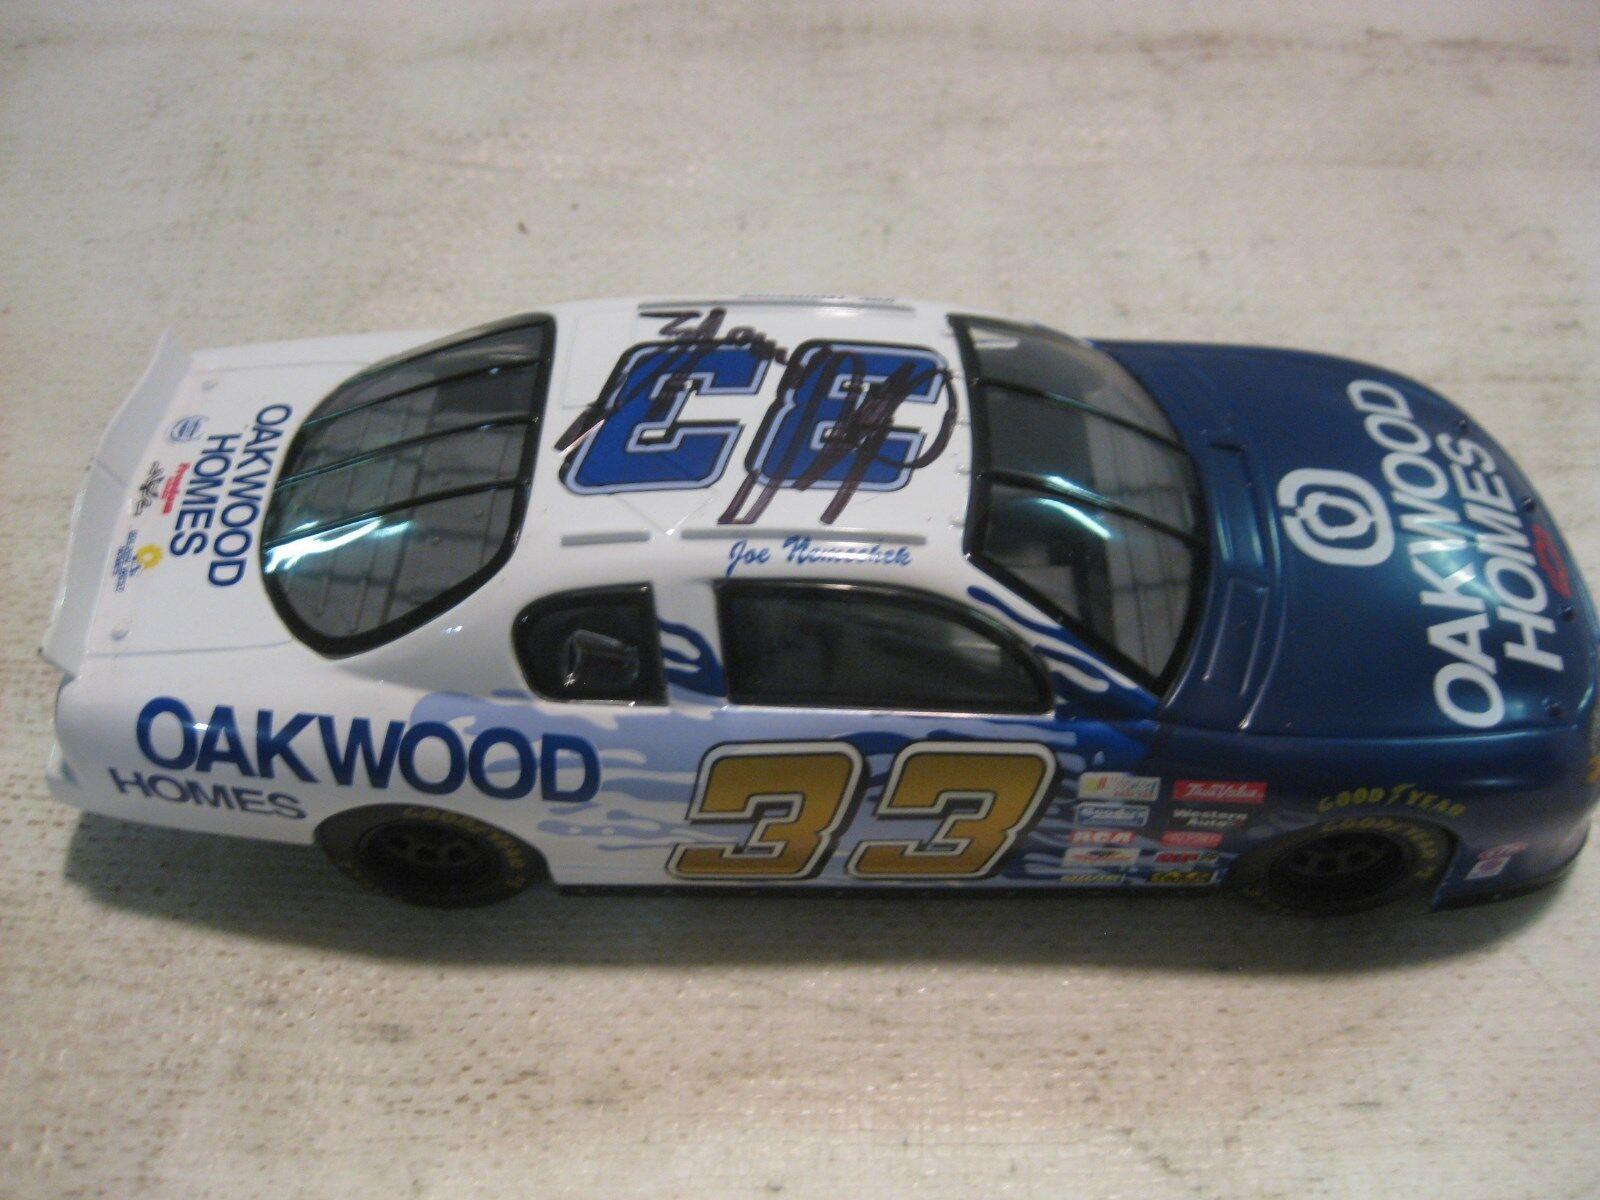 Nascar Joe Nemechek Chevy Monte Carlo 124 Scale Diecast From RC 2000   dc575